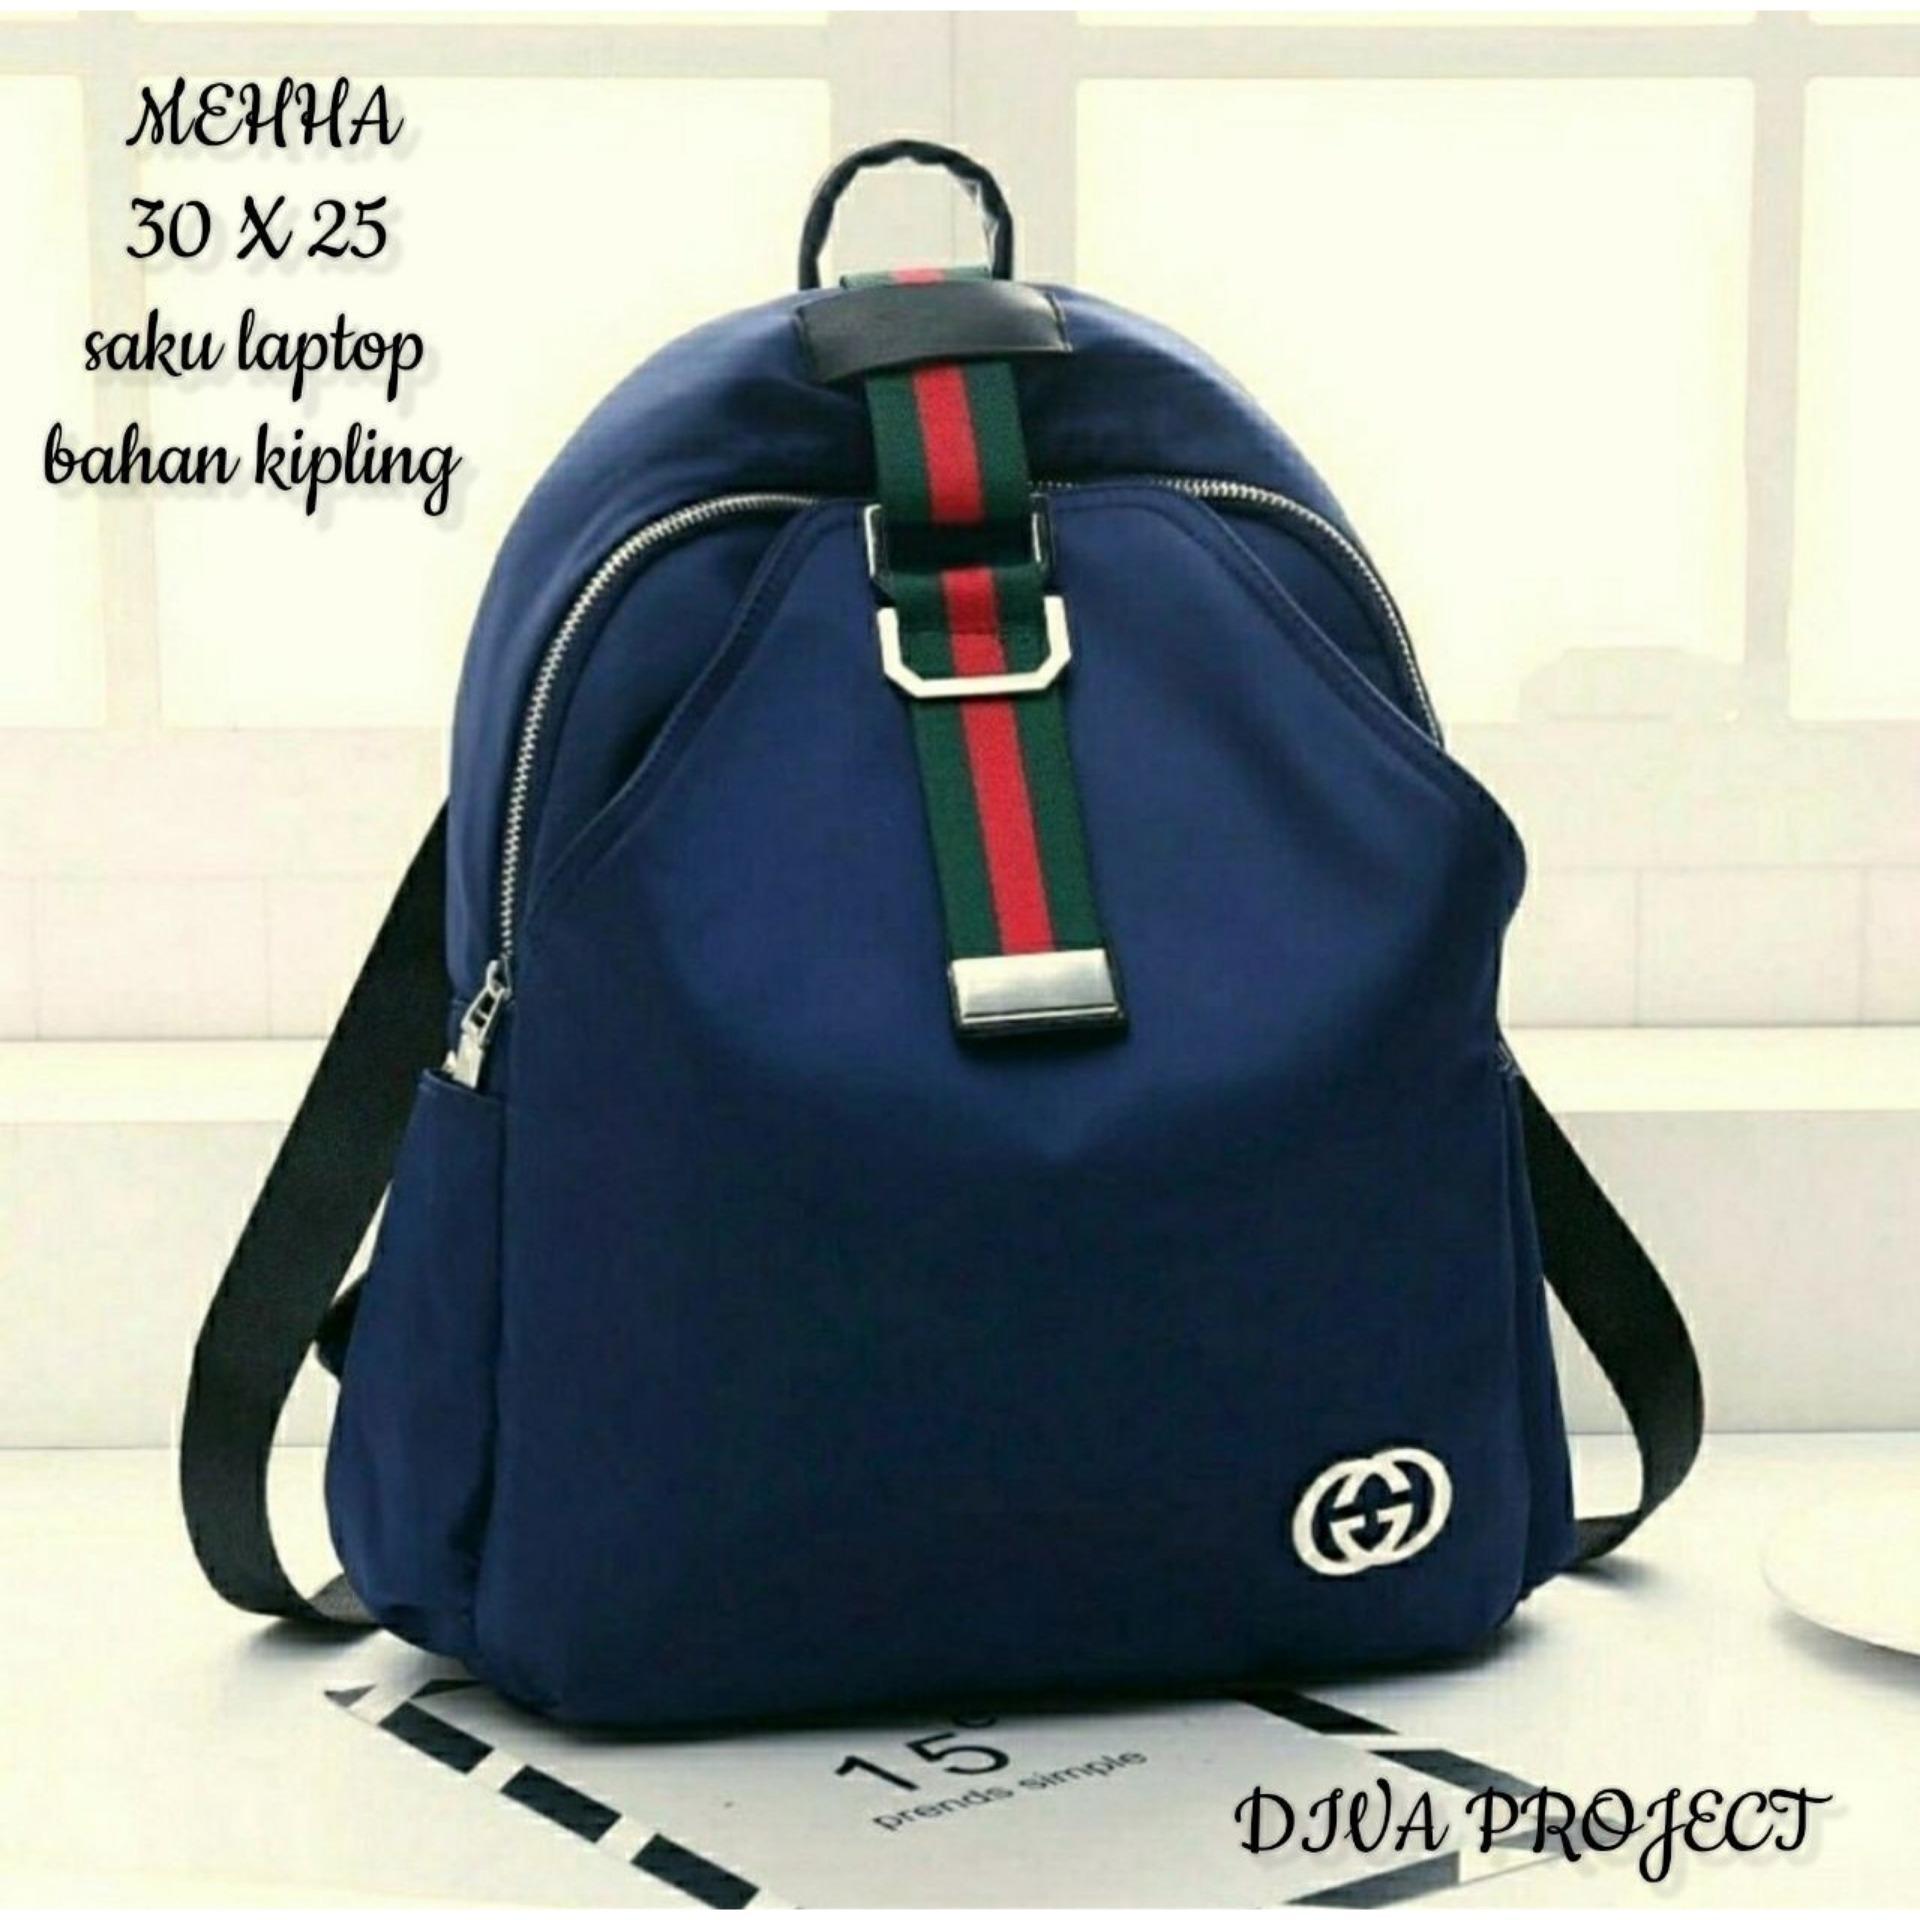 DoubleC Fashion Backpack Bugayo / Tas Wanita /Backpack / Ransel / Tas Anak /Tas ransel Wanita